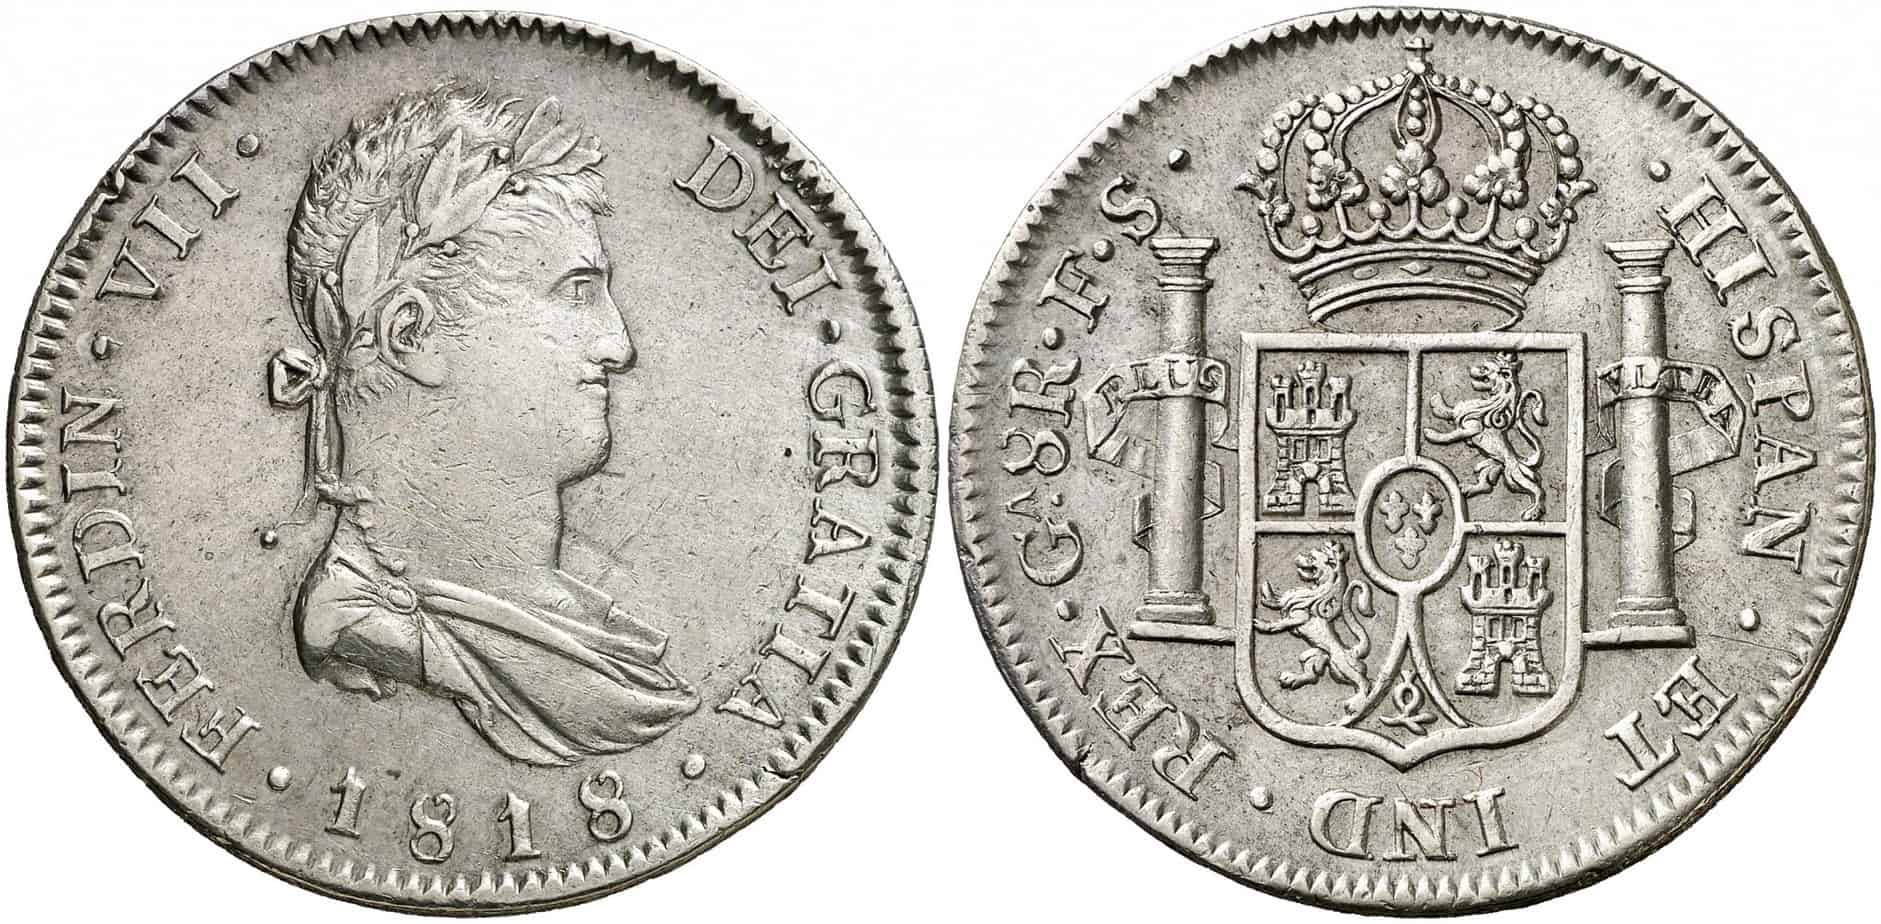 8 reales Guadelajara 1818